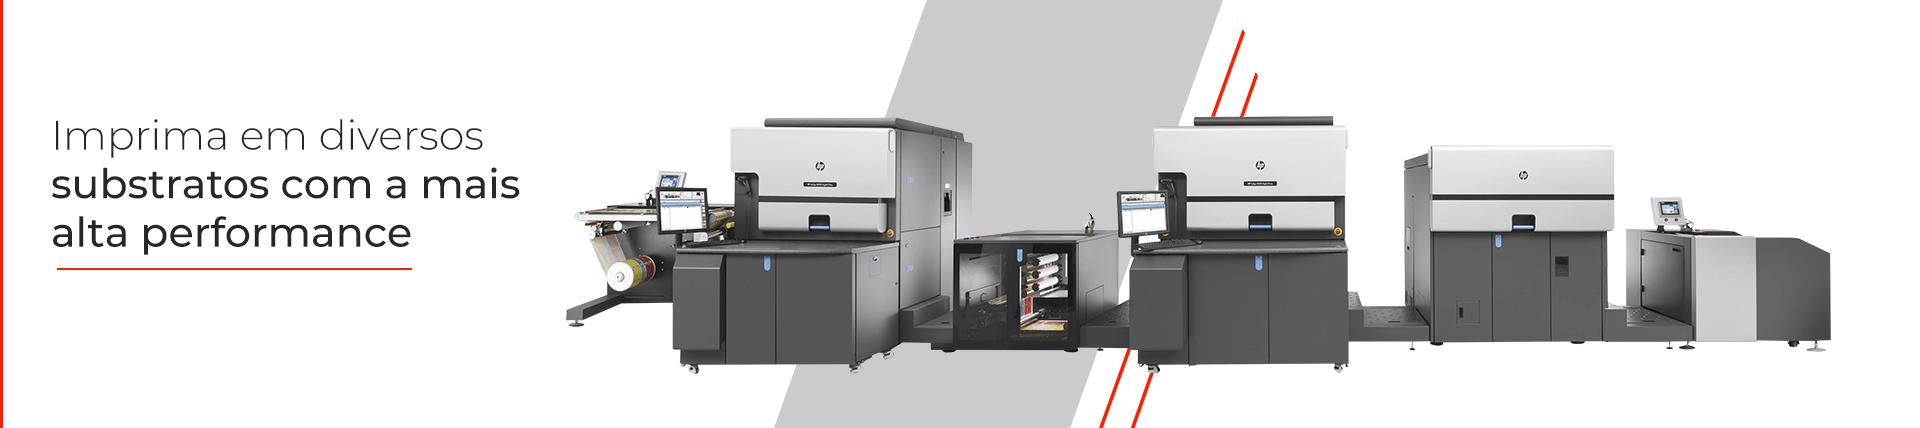 Impressora Hp Indigo 8000 pra Etiquetas